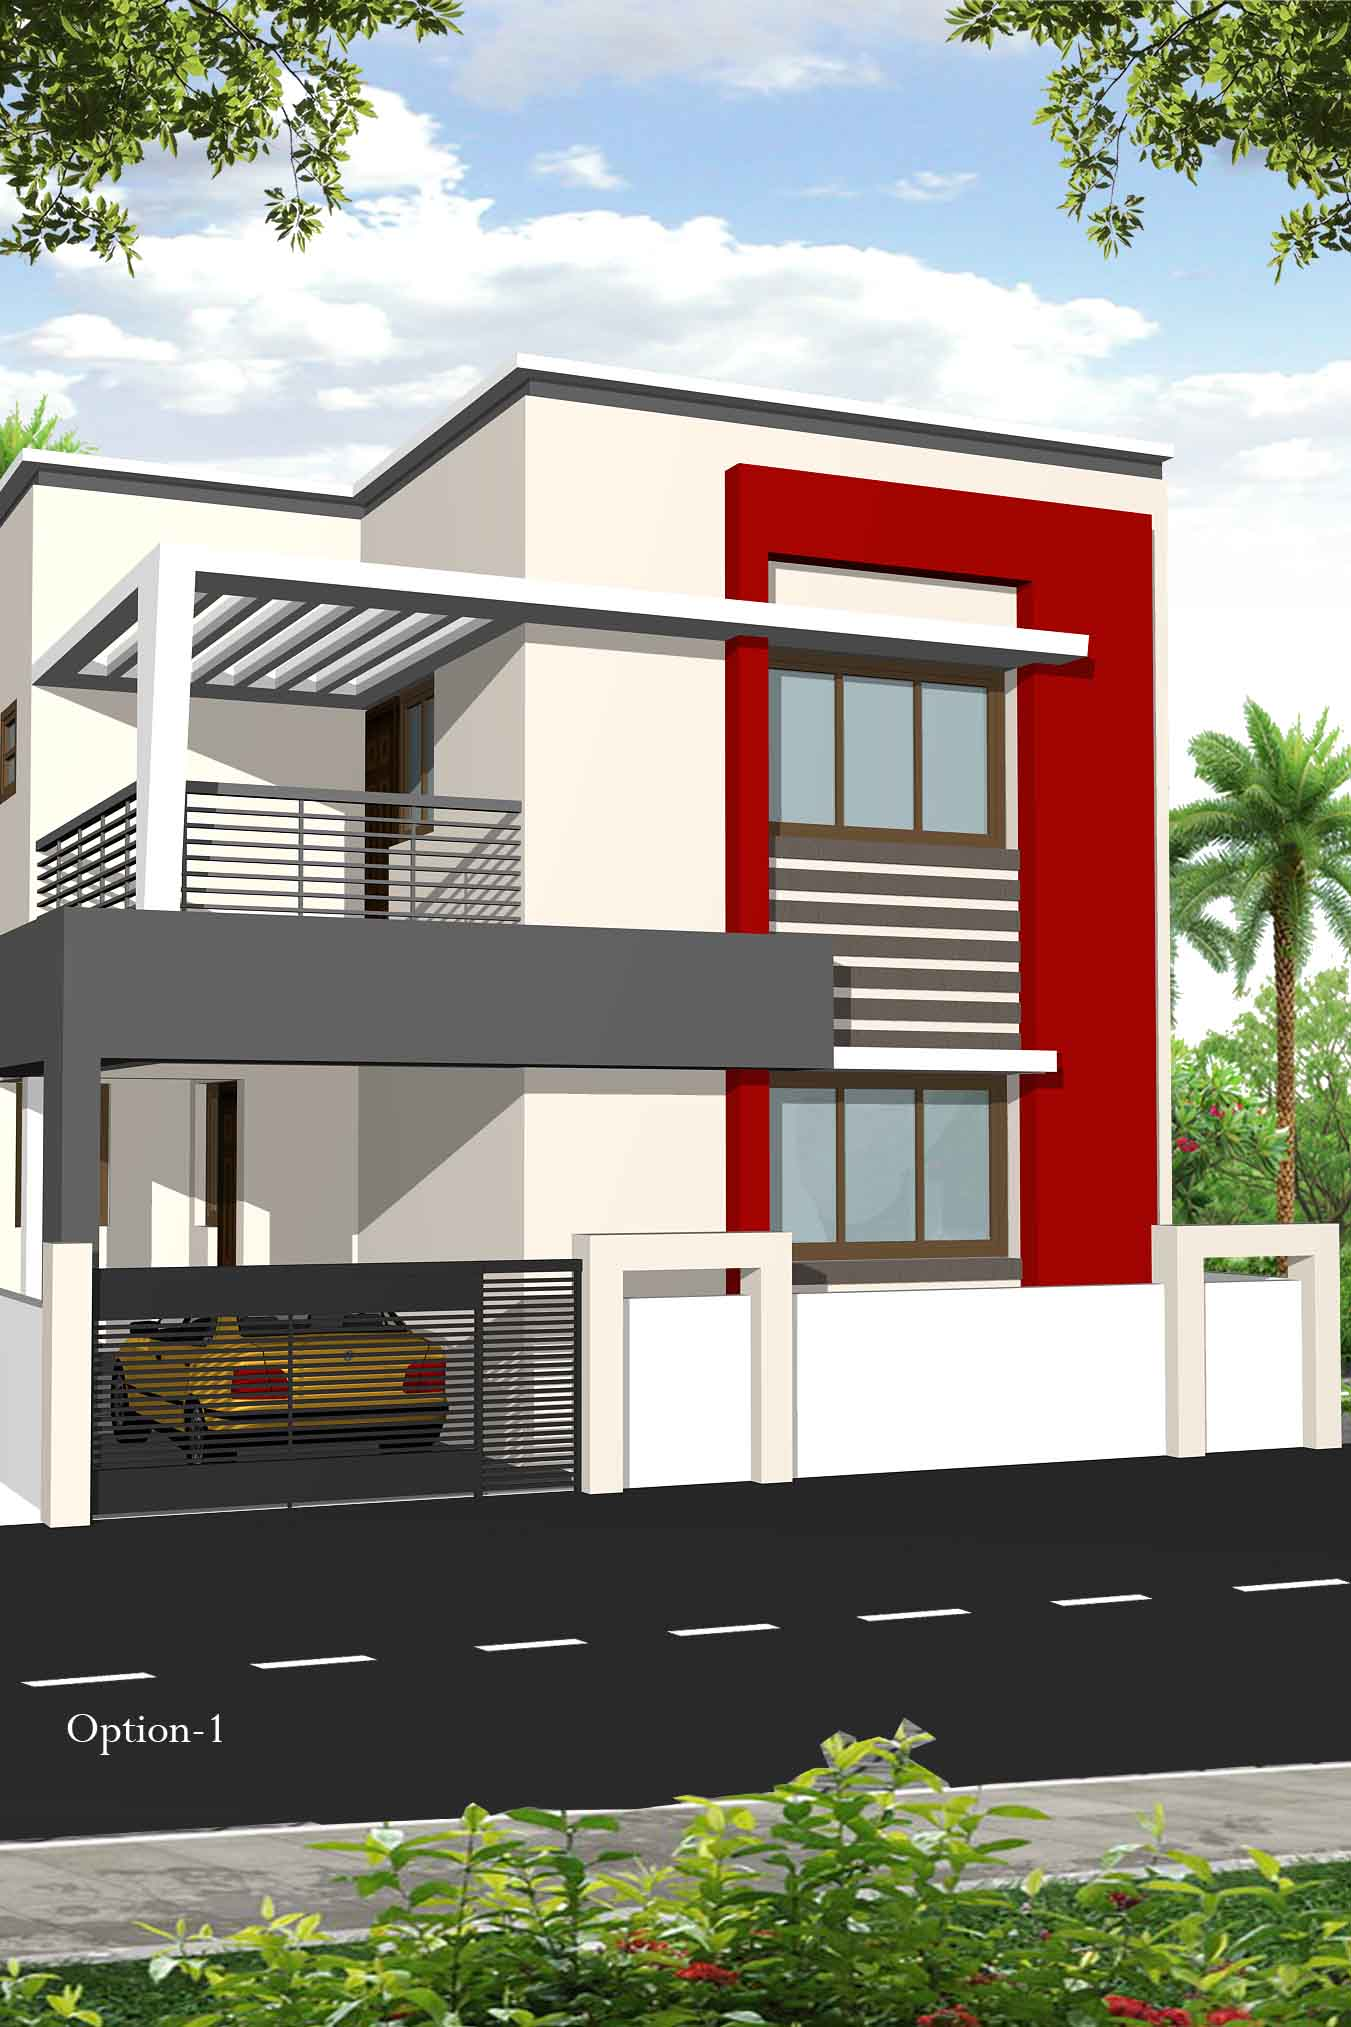 Individual model house